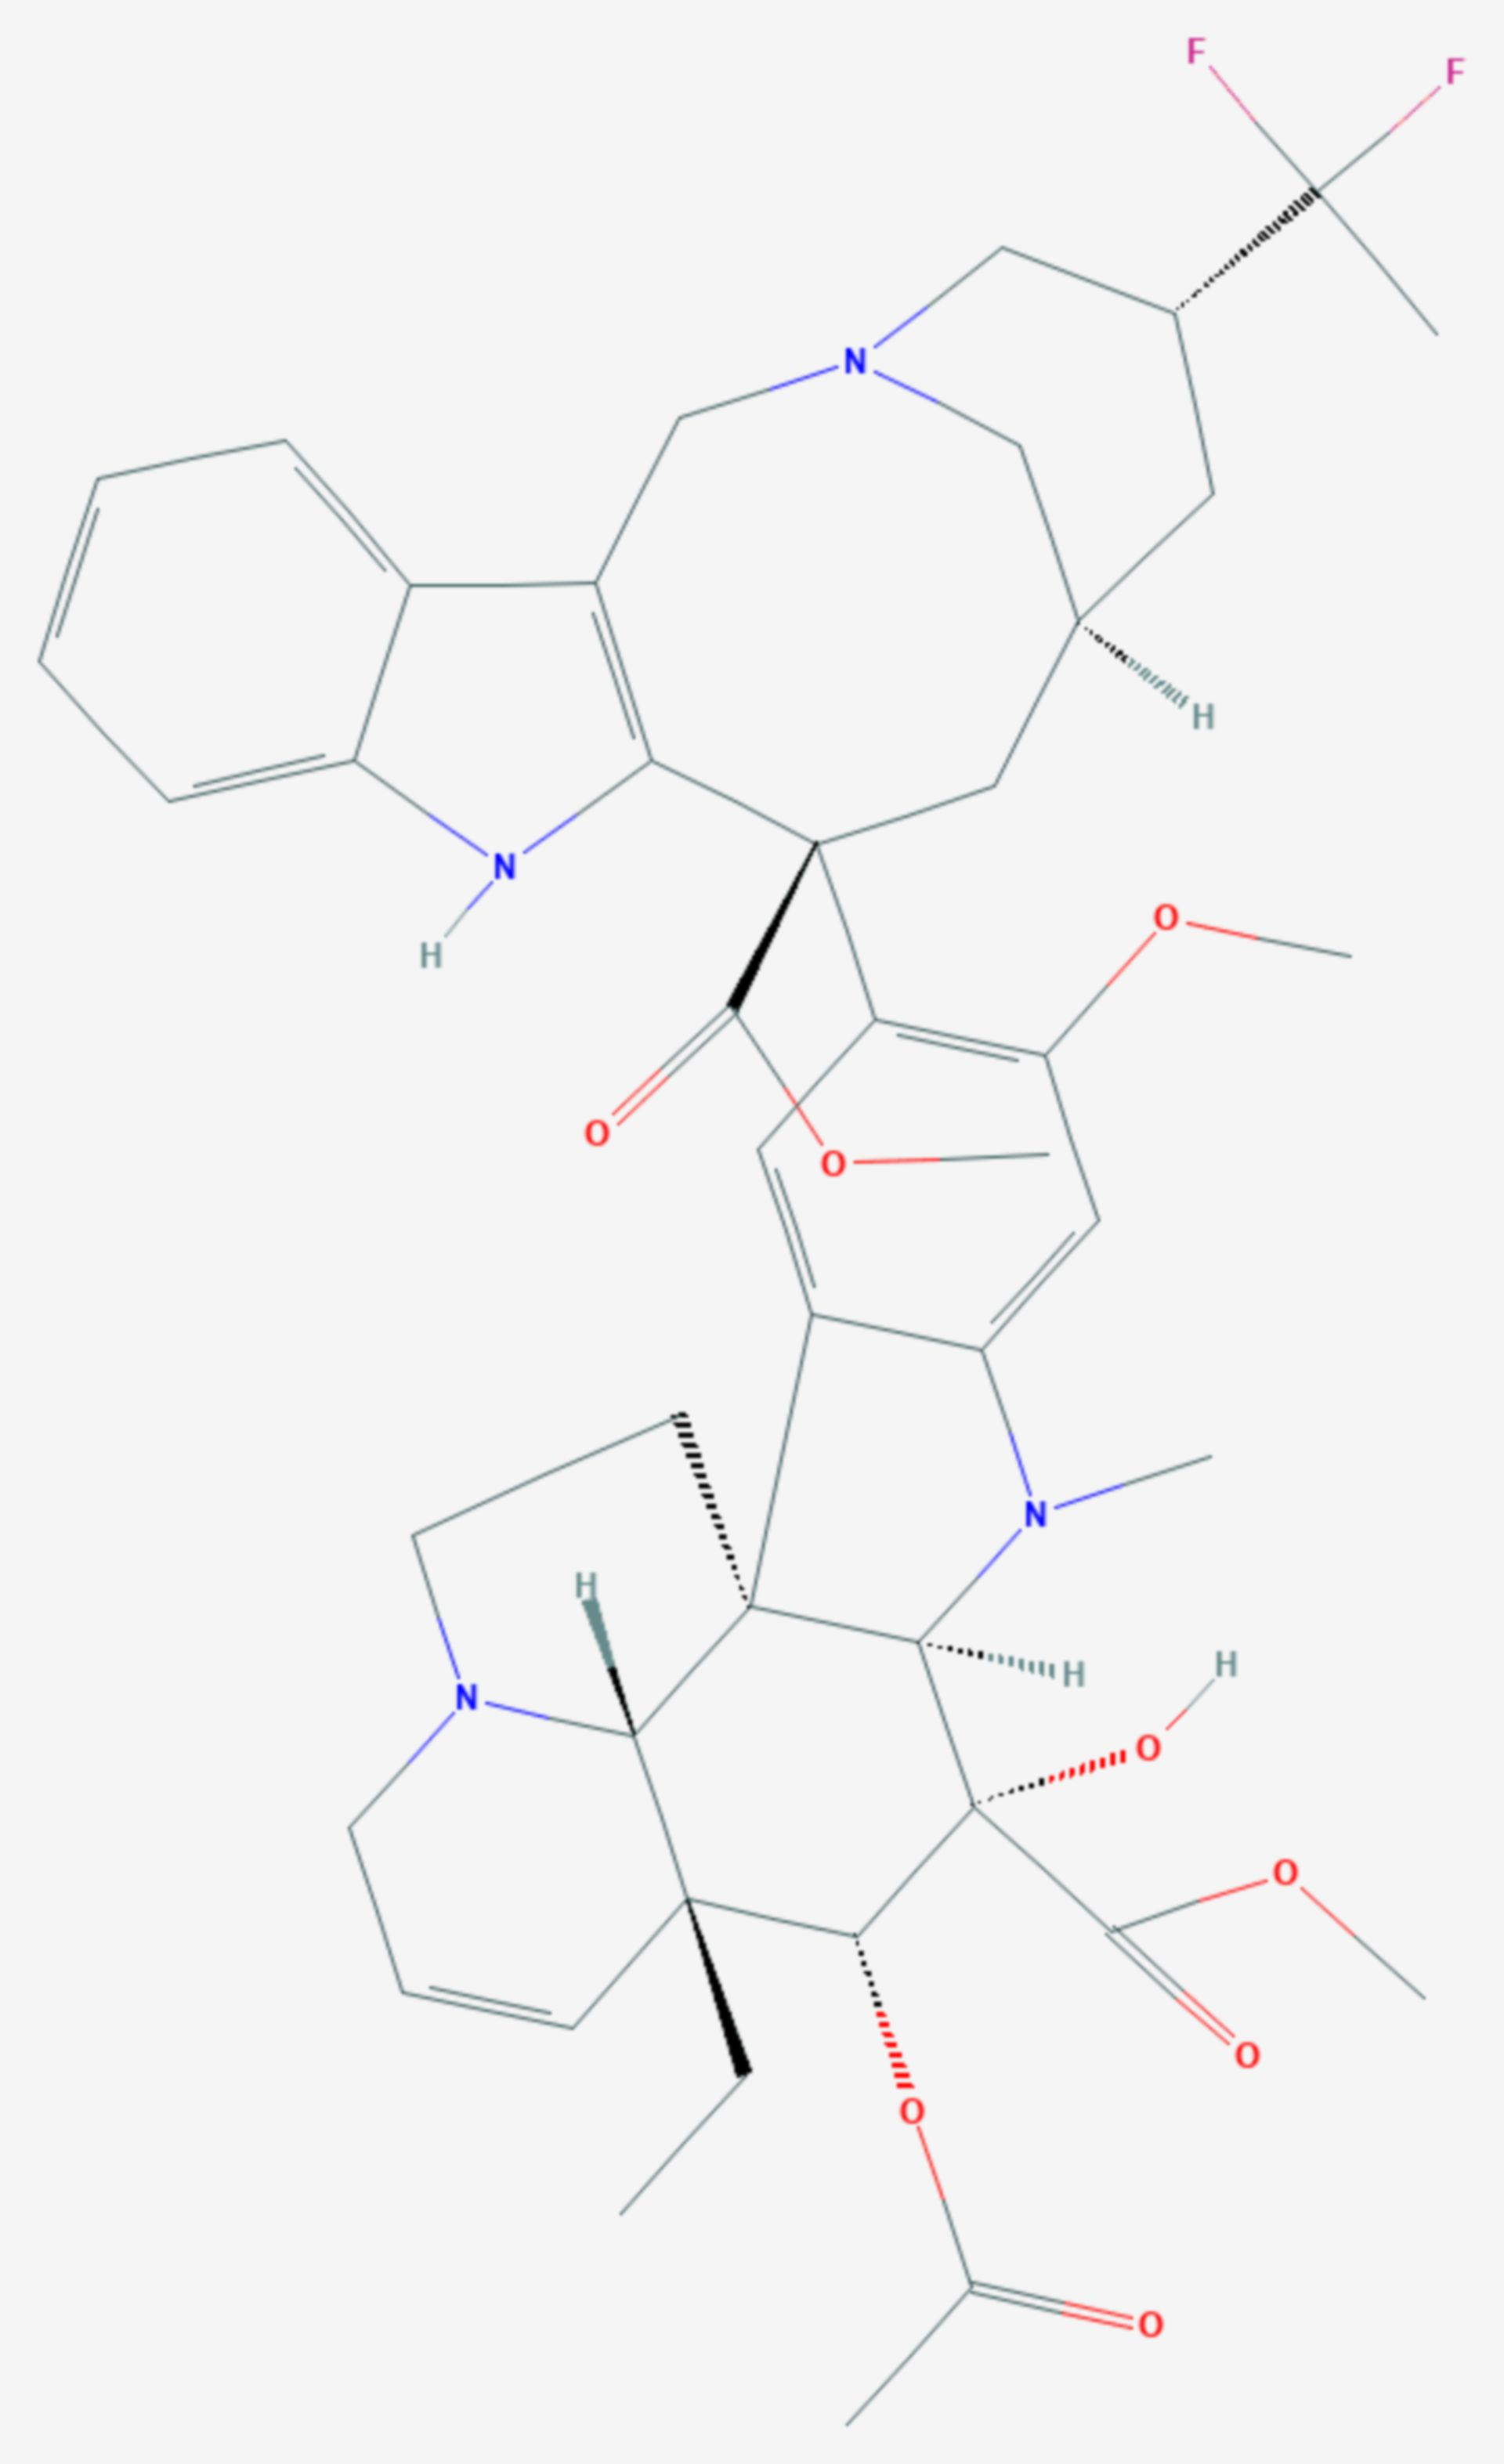 Vinflunin (Strukturformel)